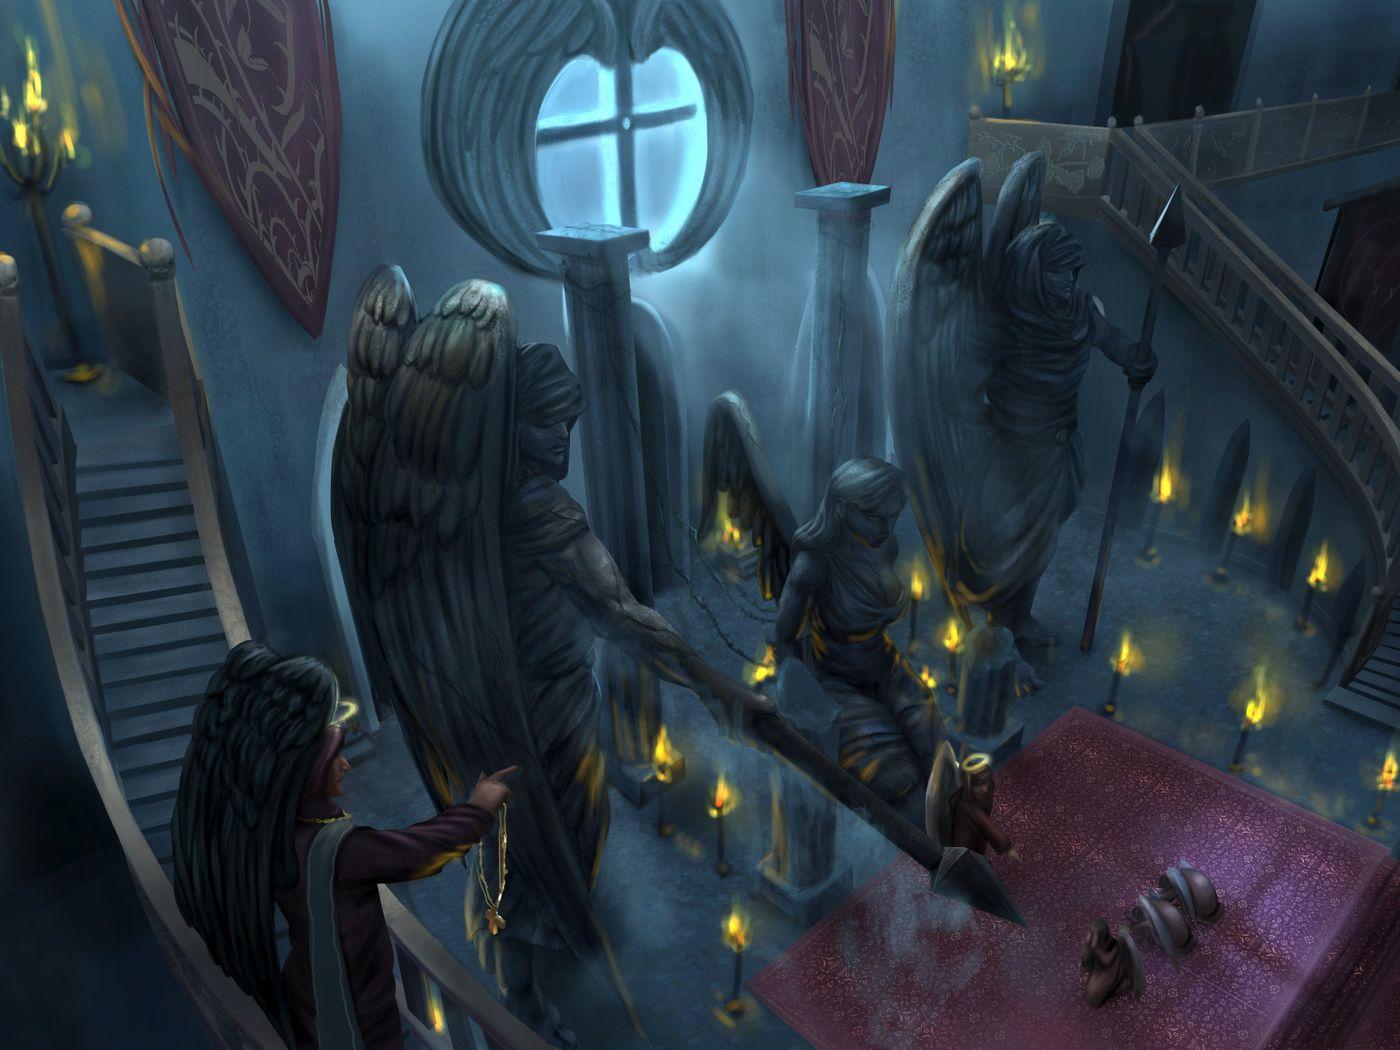 Dark cathedral environment design